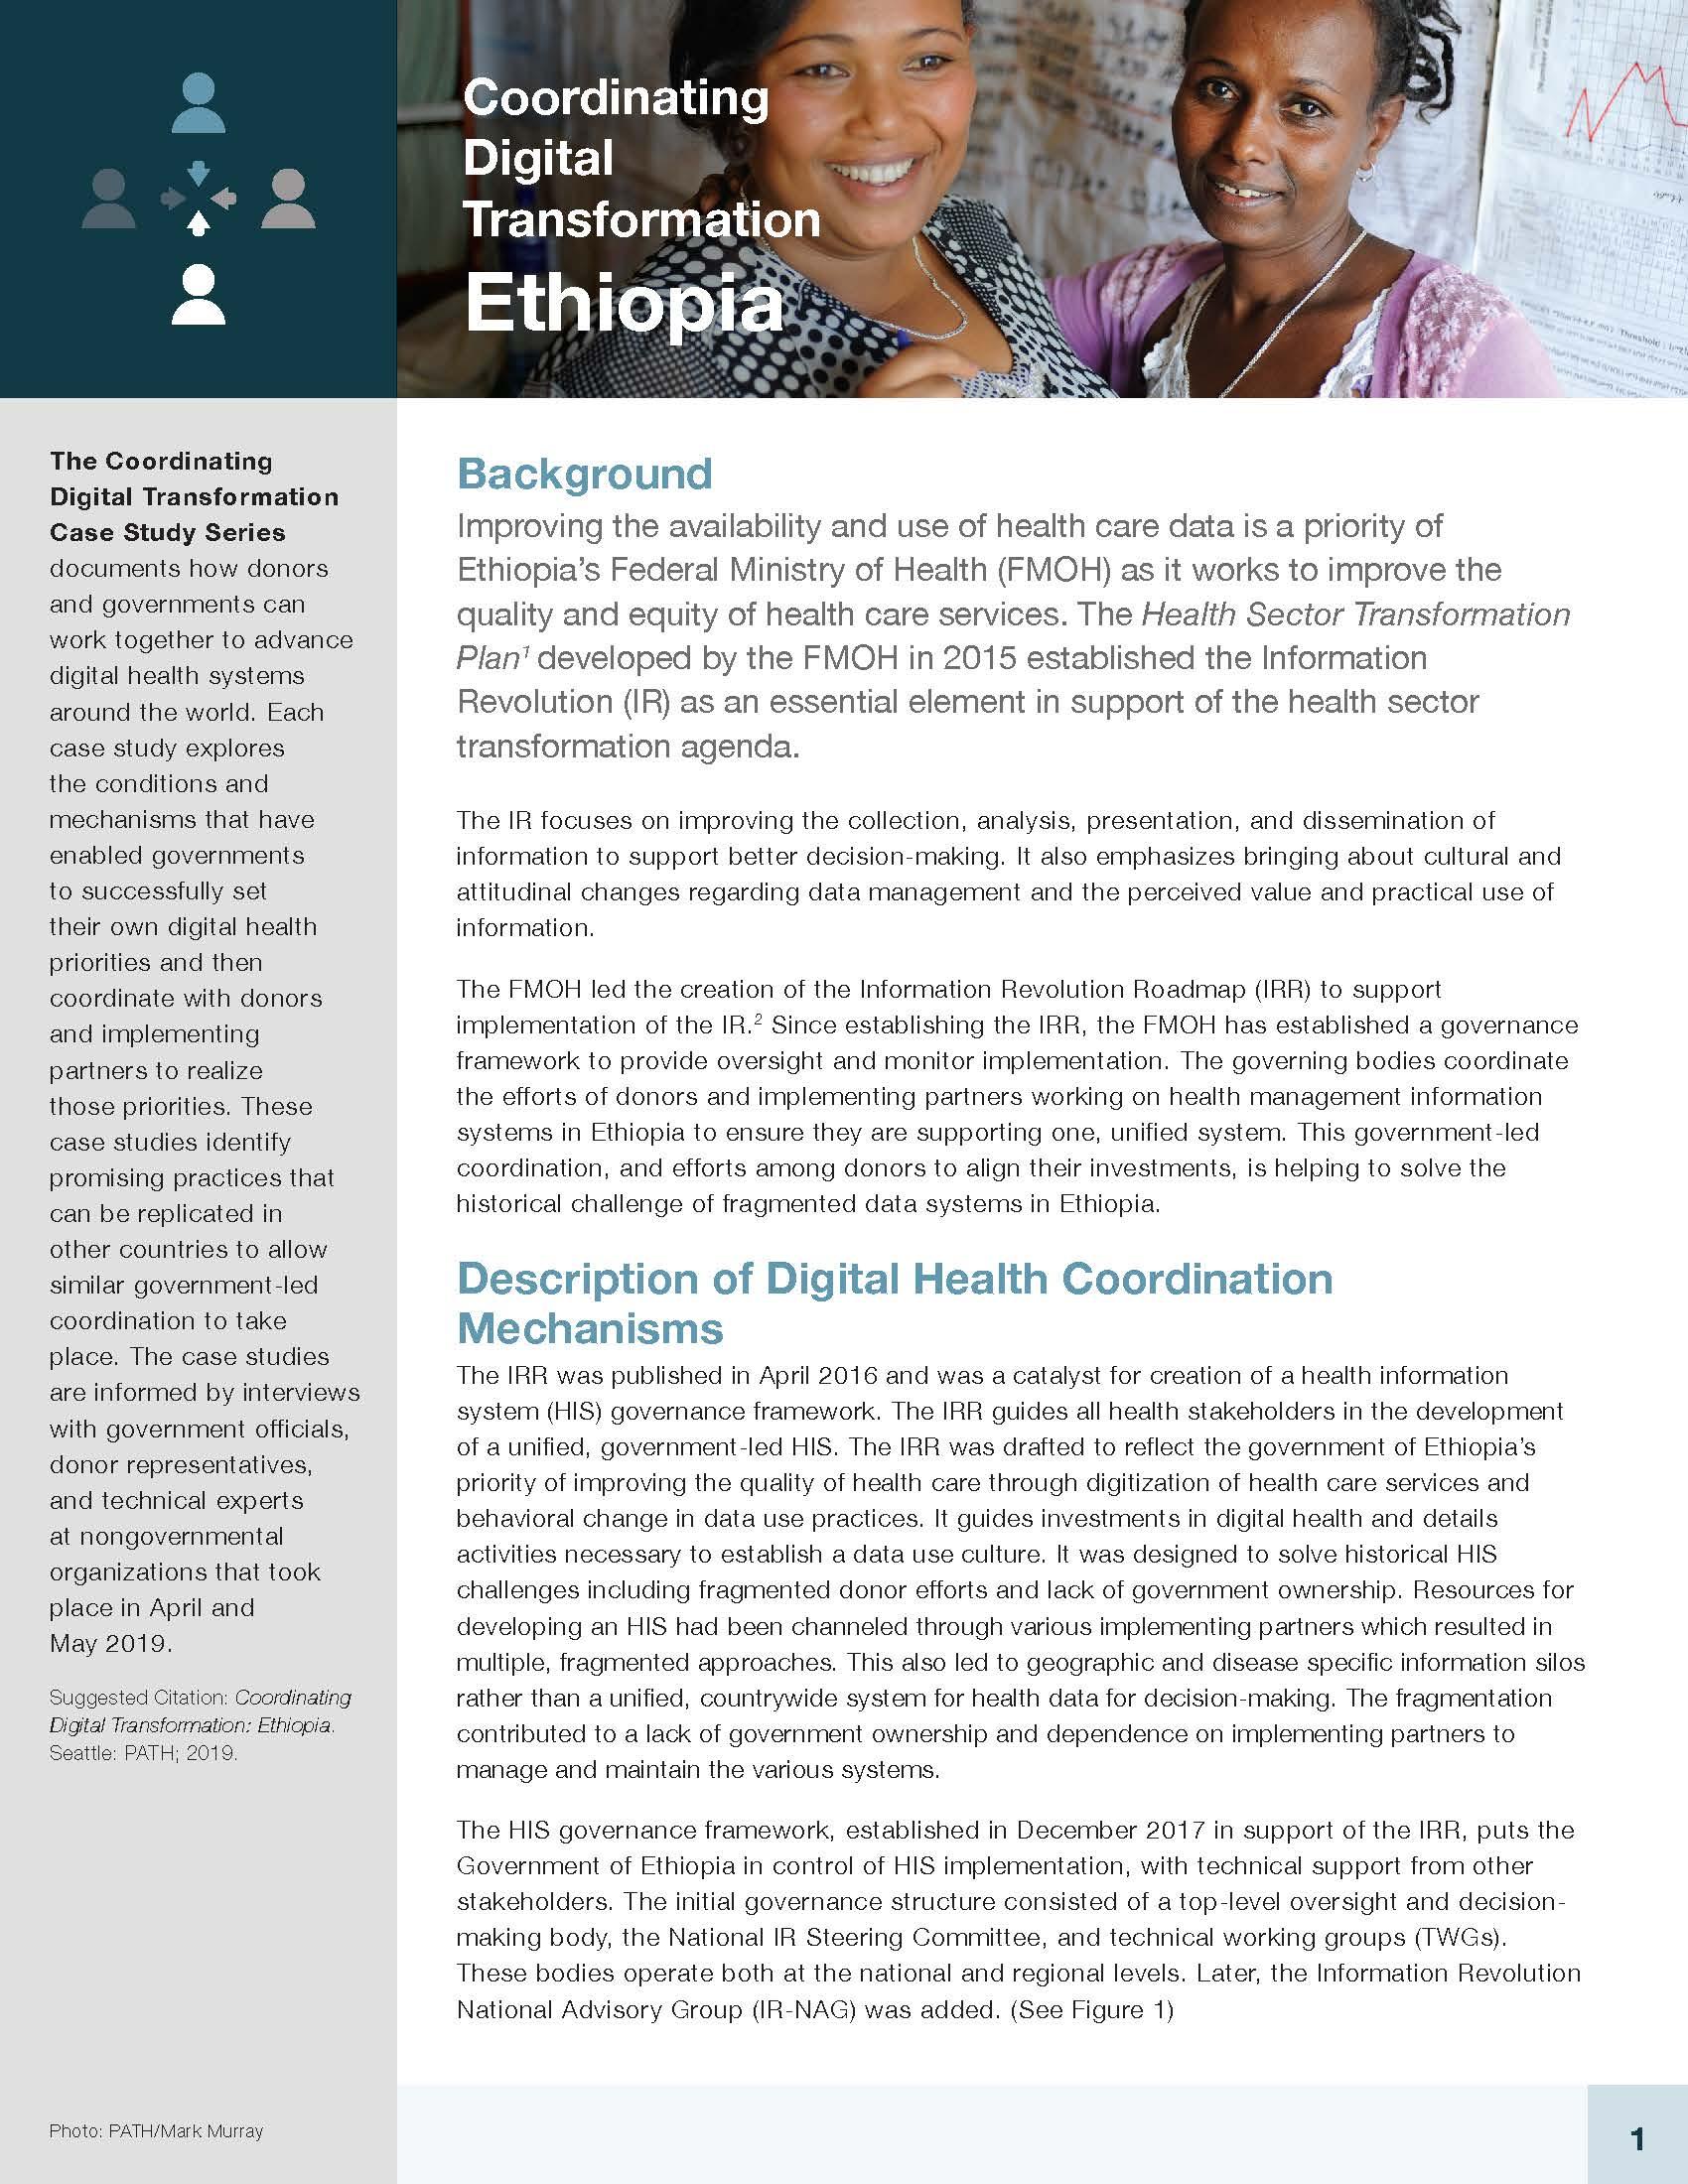 DGSQ_Donor-Coord-Case-Studies_ETHIOPIA_R1.jpg